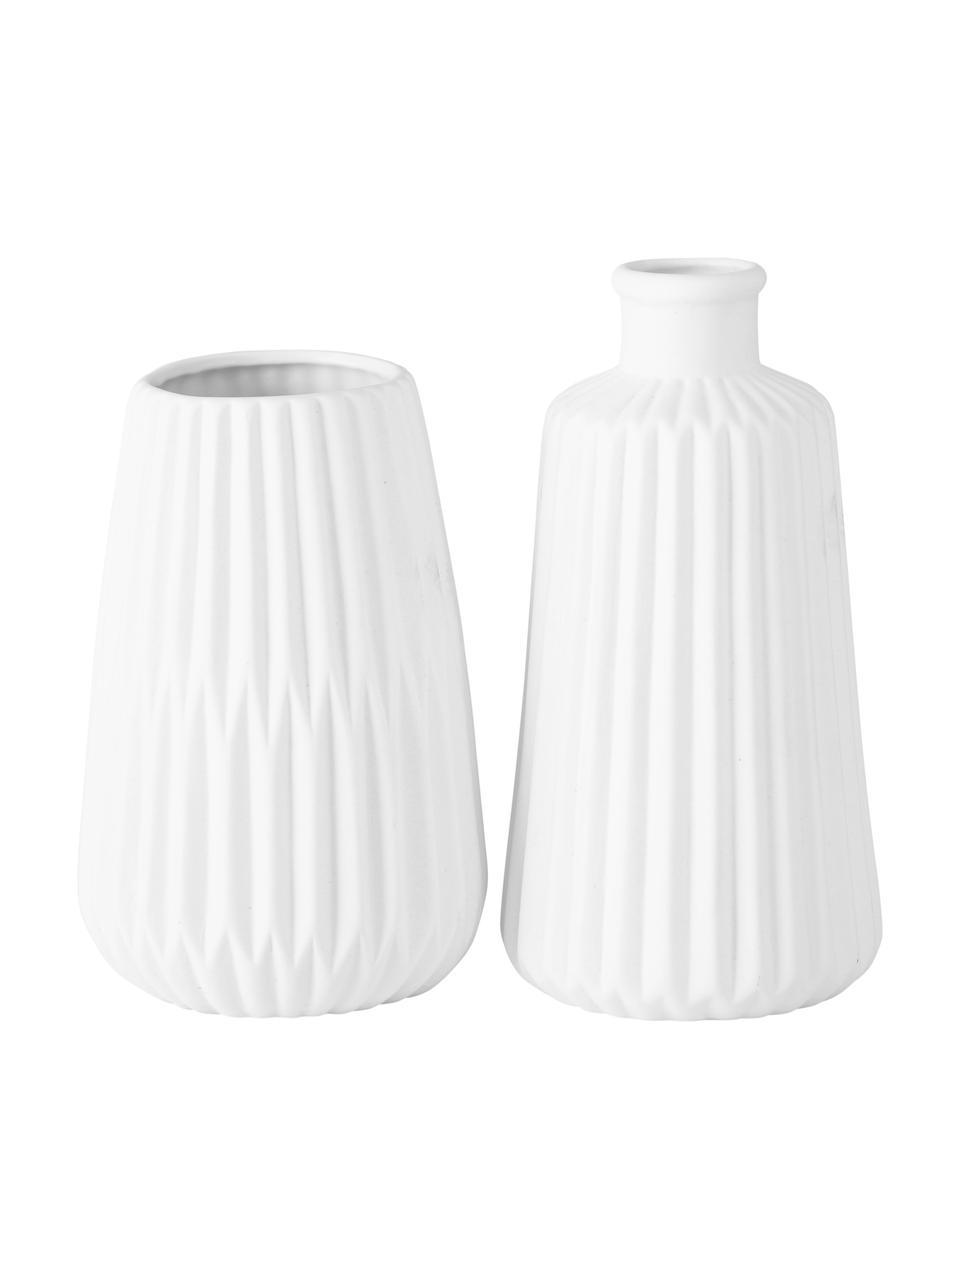 Set 2 vasi decorativi in porcellana Esko, Porcellana, Bianco, Ø 8 x Alt. 17 cm